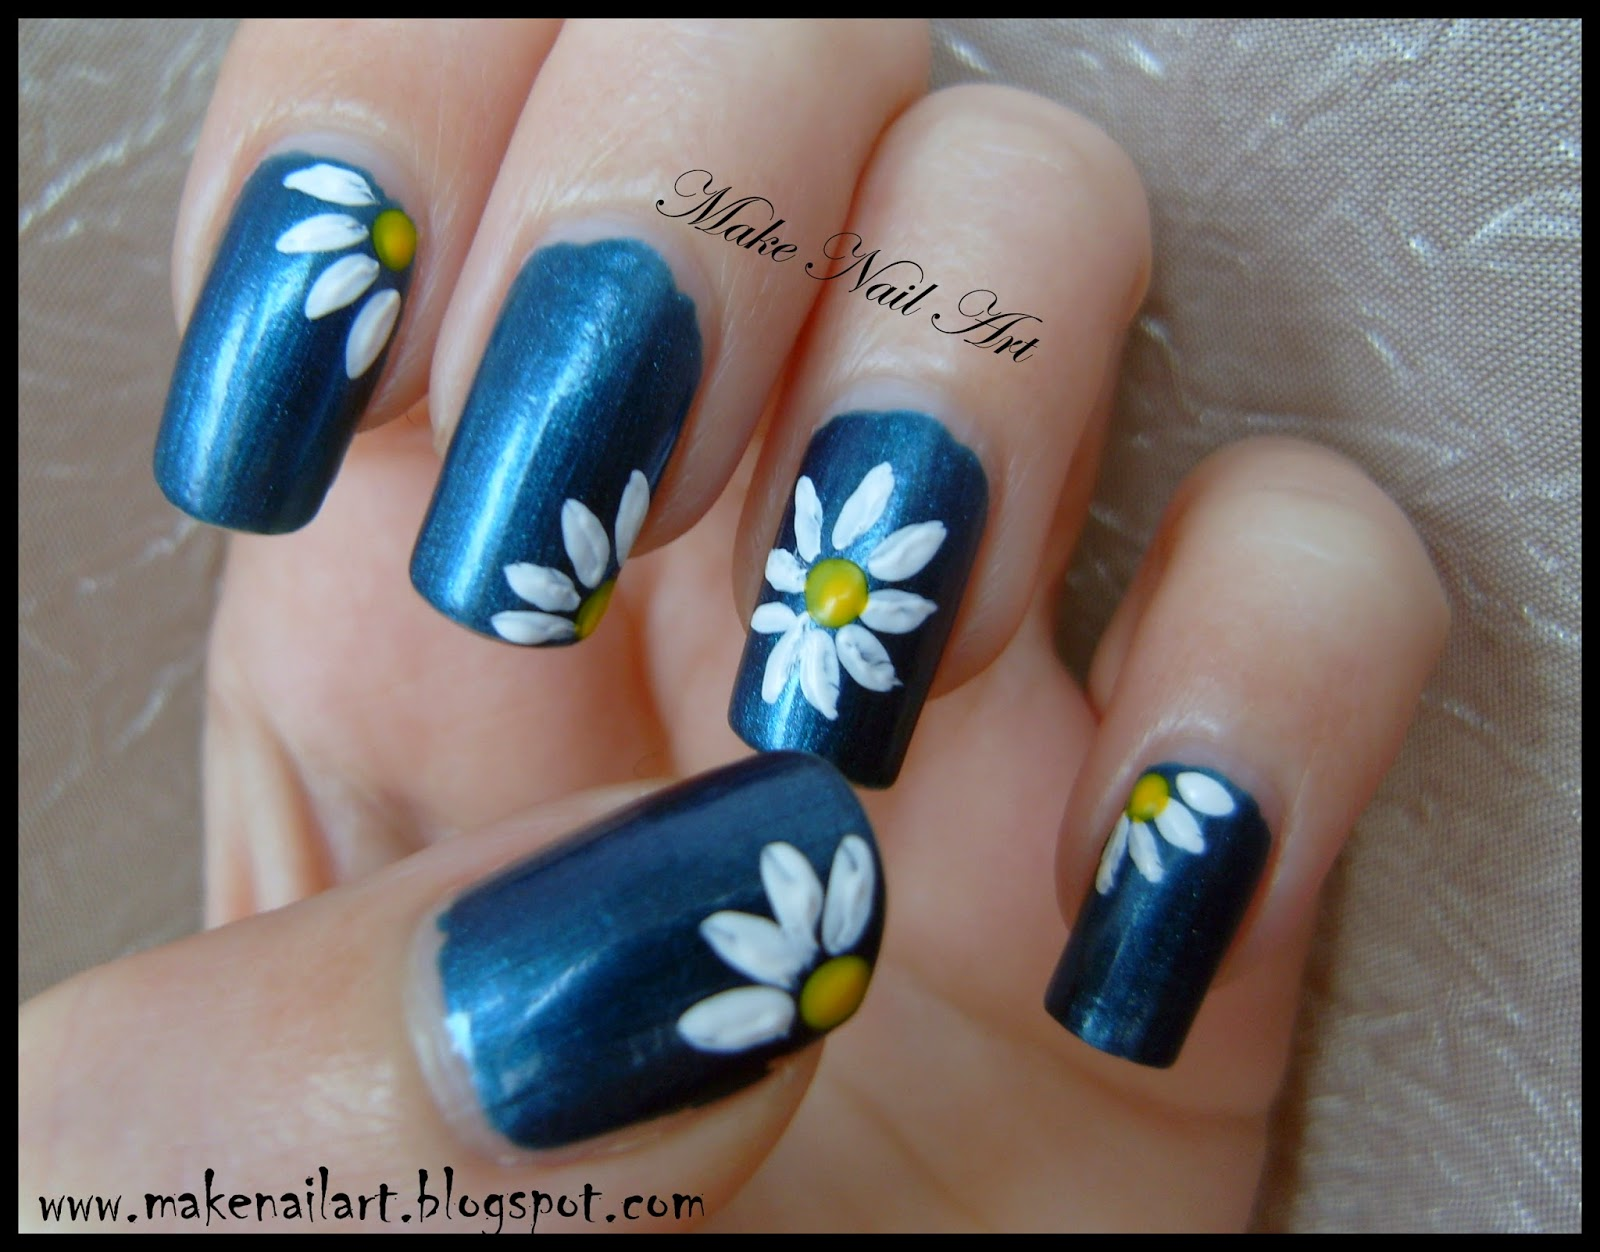 Make Nail Art: February 2014